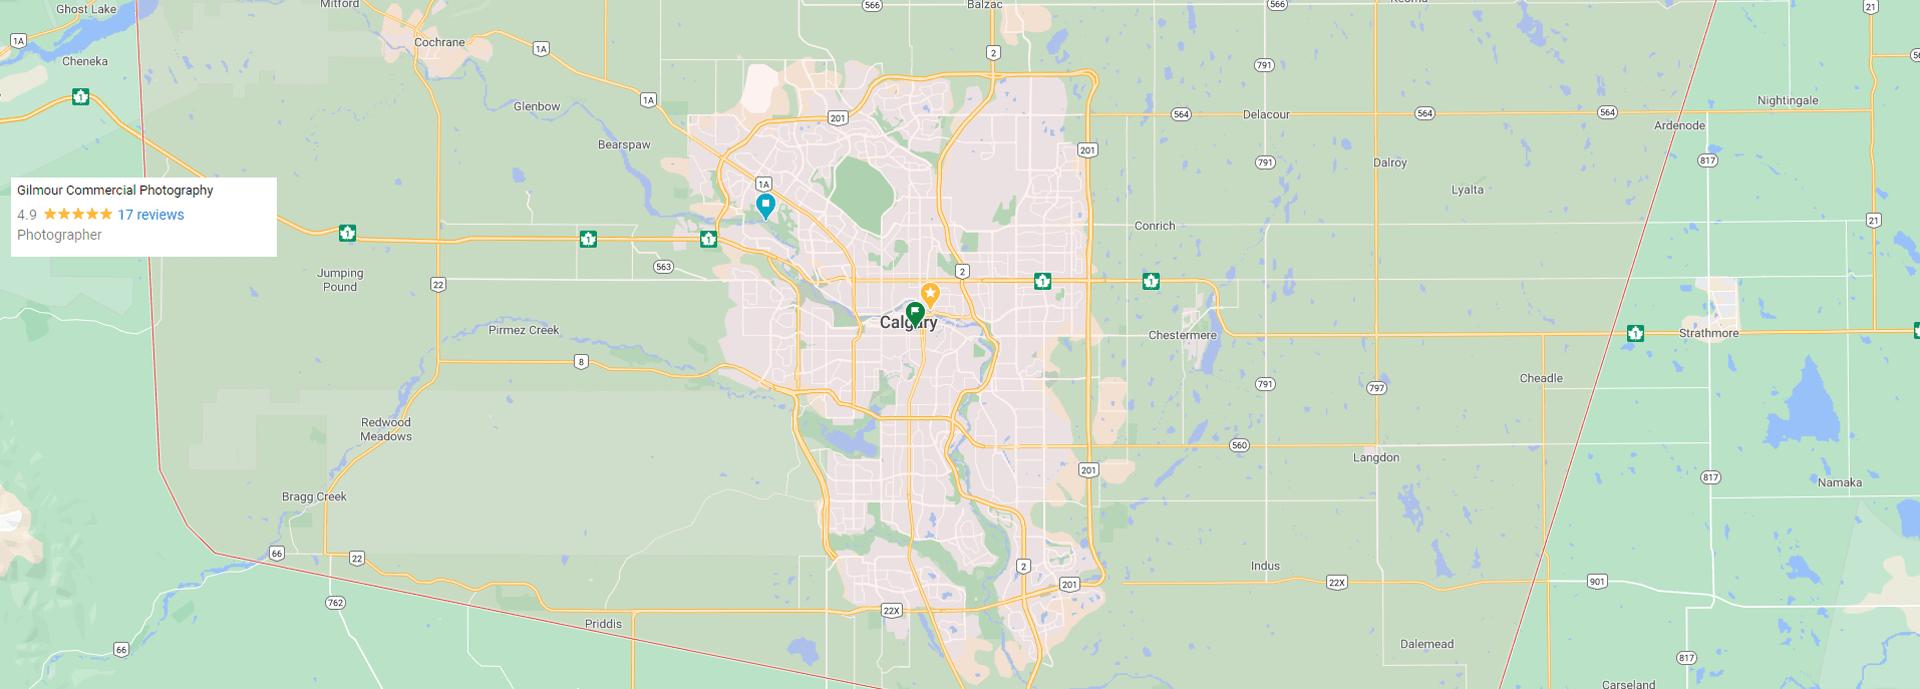 map of service area for Calgary local photographer Brett Gilmour